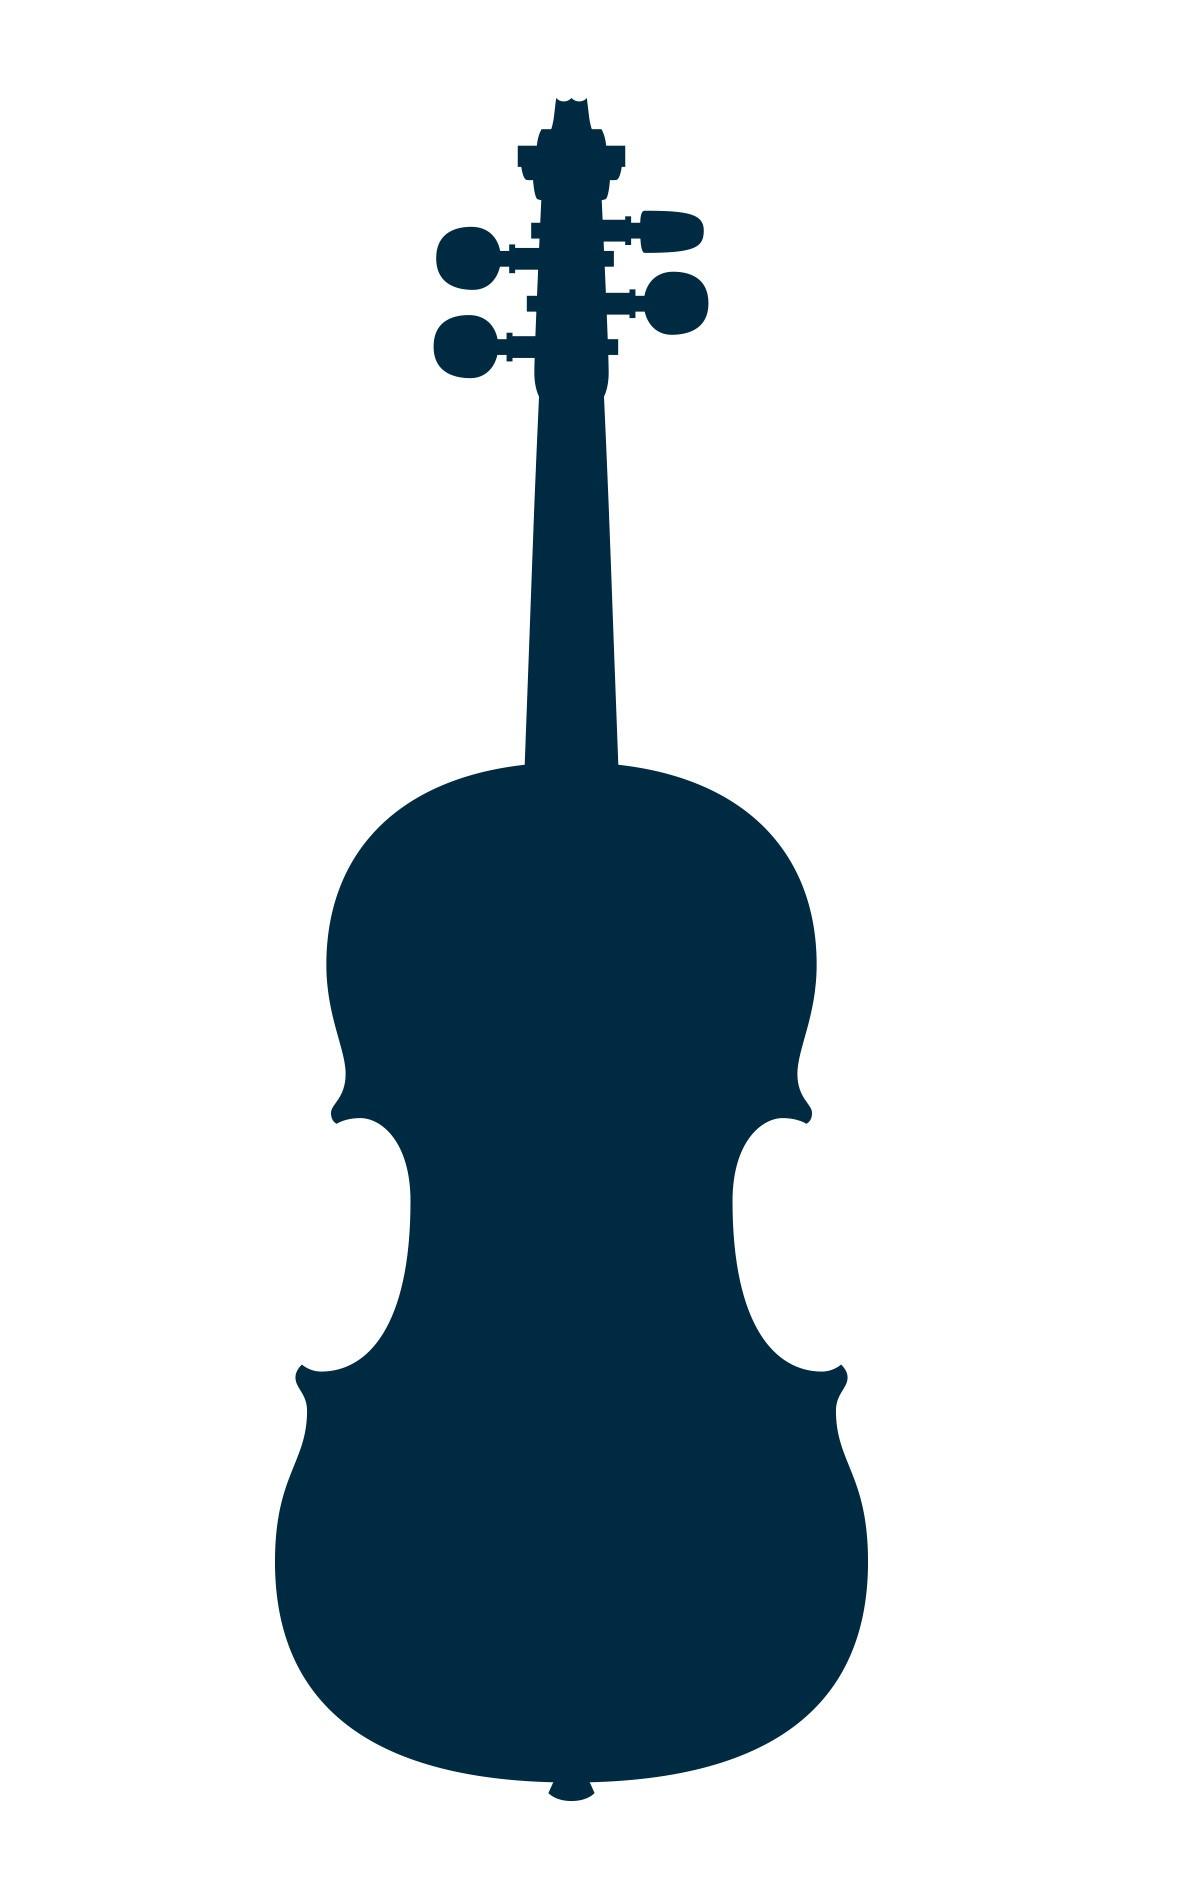 Czech violin by Jan Basta